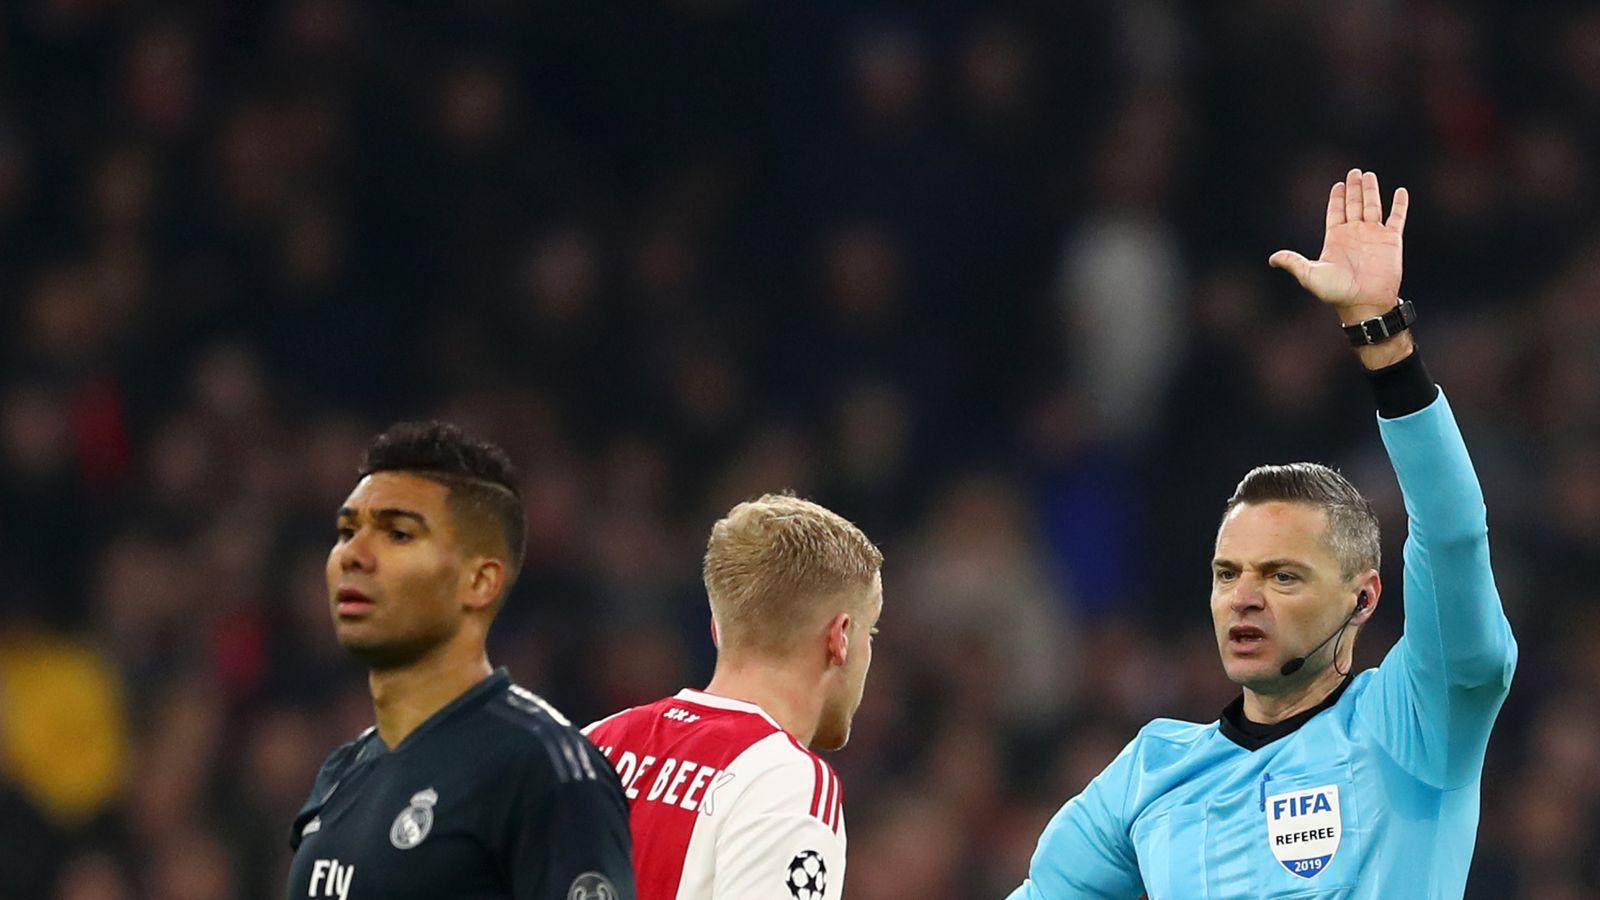 Ajax 1 - 2 R Madrid - Match Report & Highlights